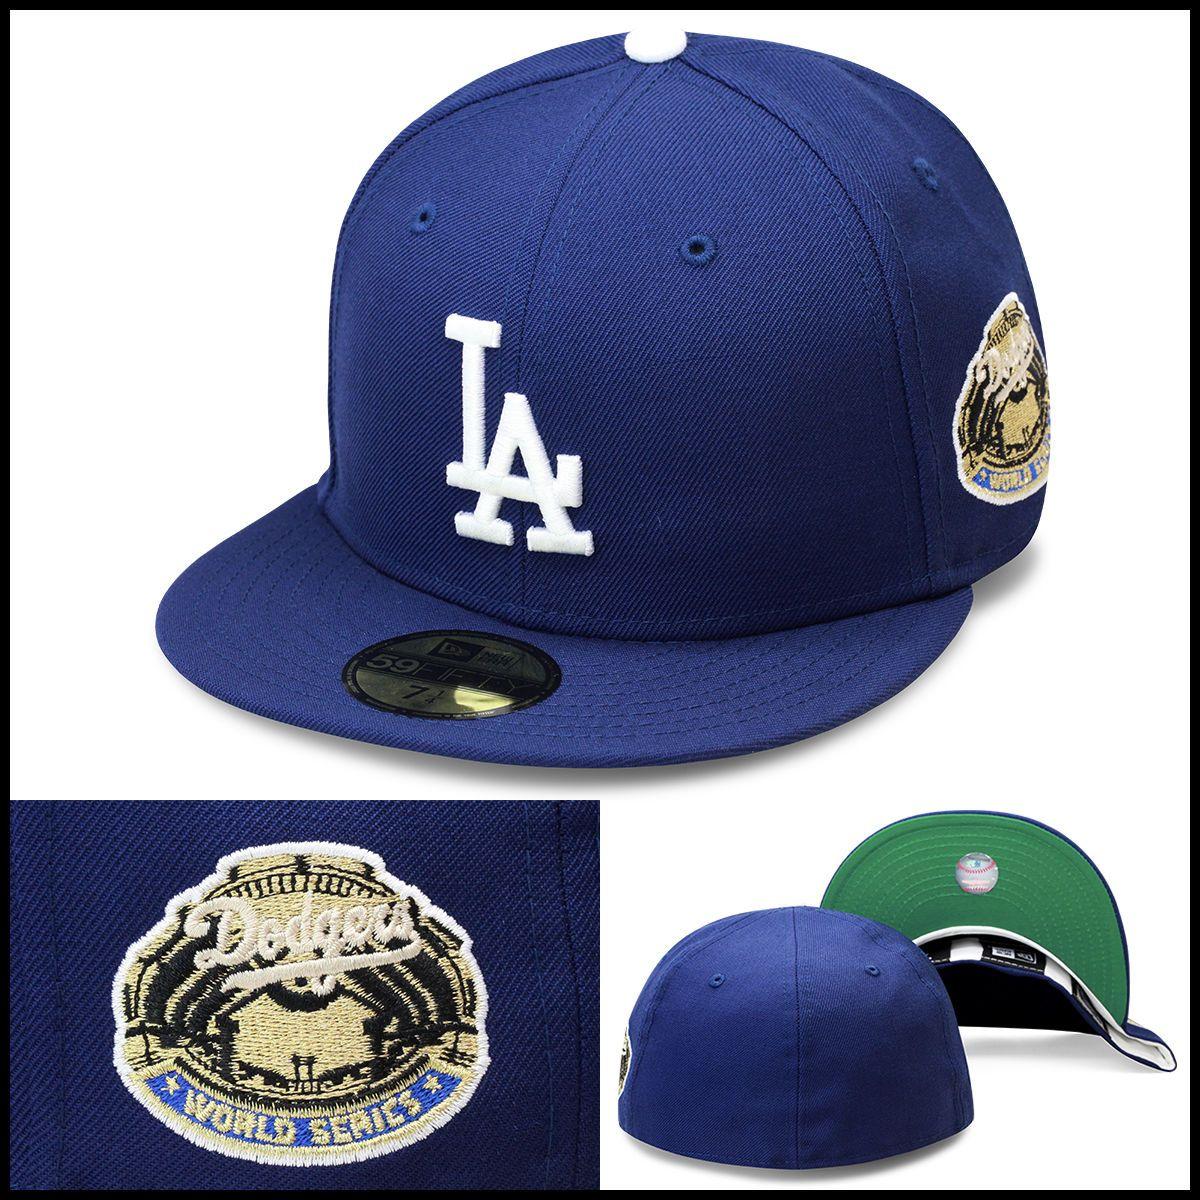 La World Series Hat Shopping 6531f 10ebe